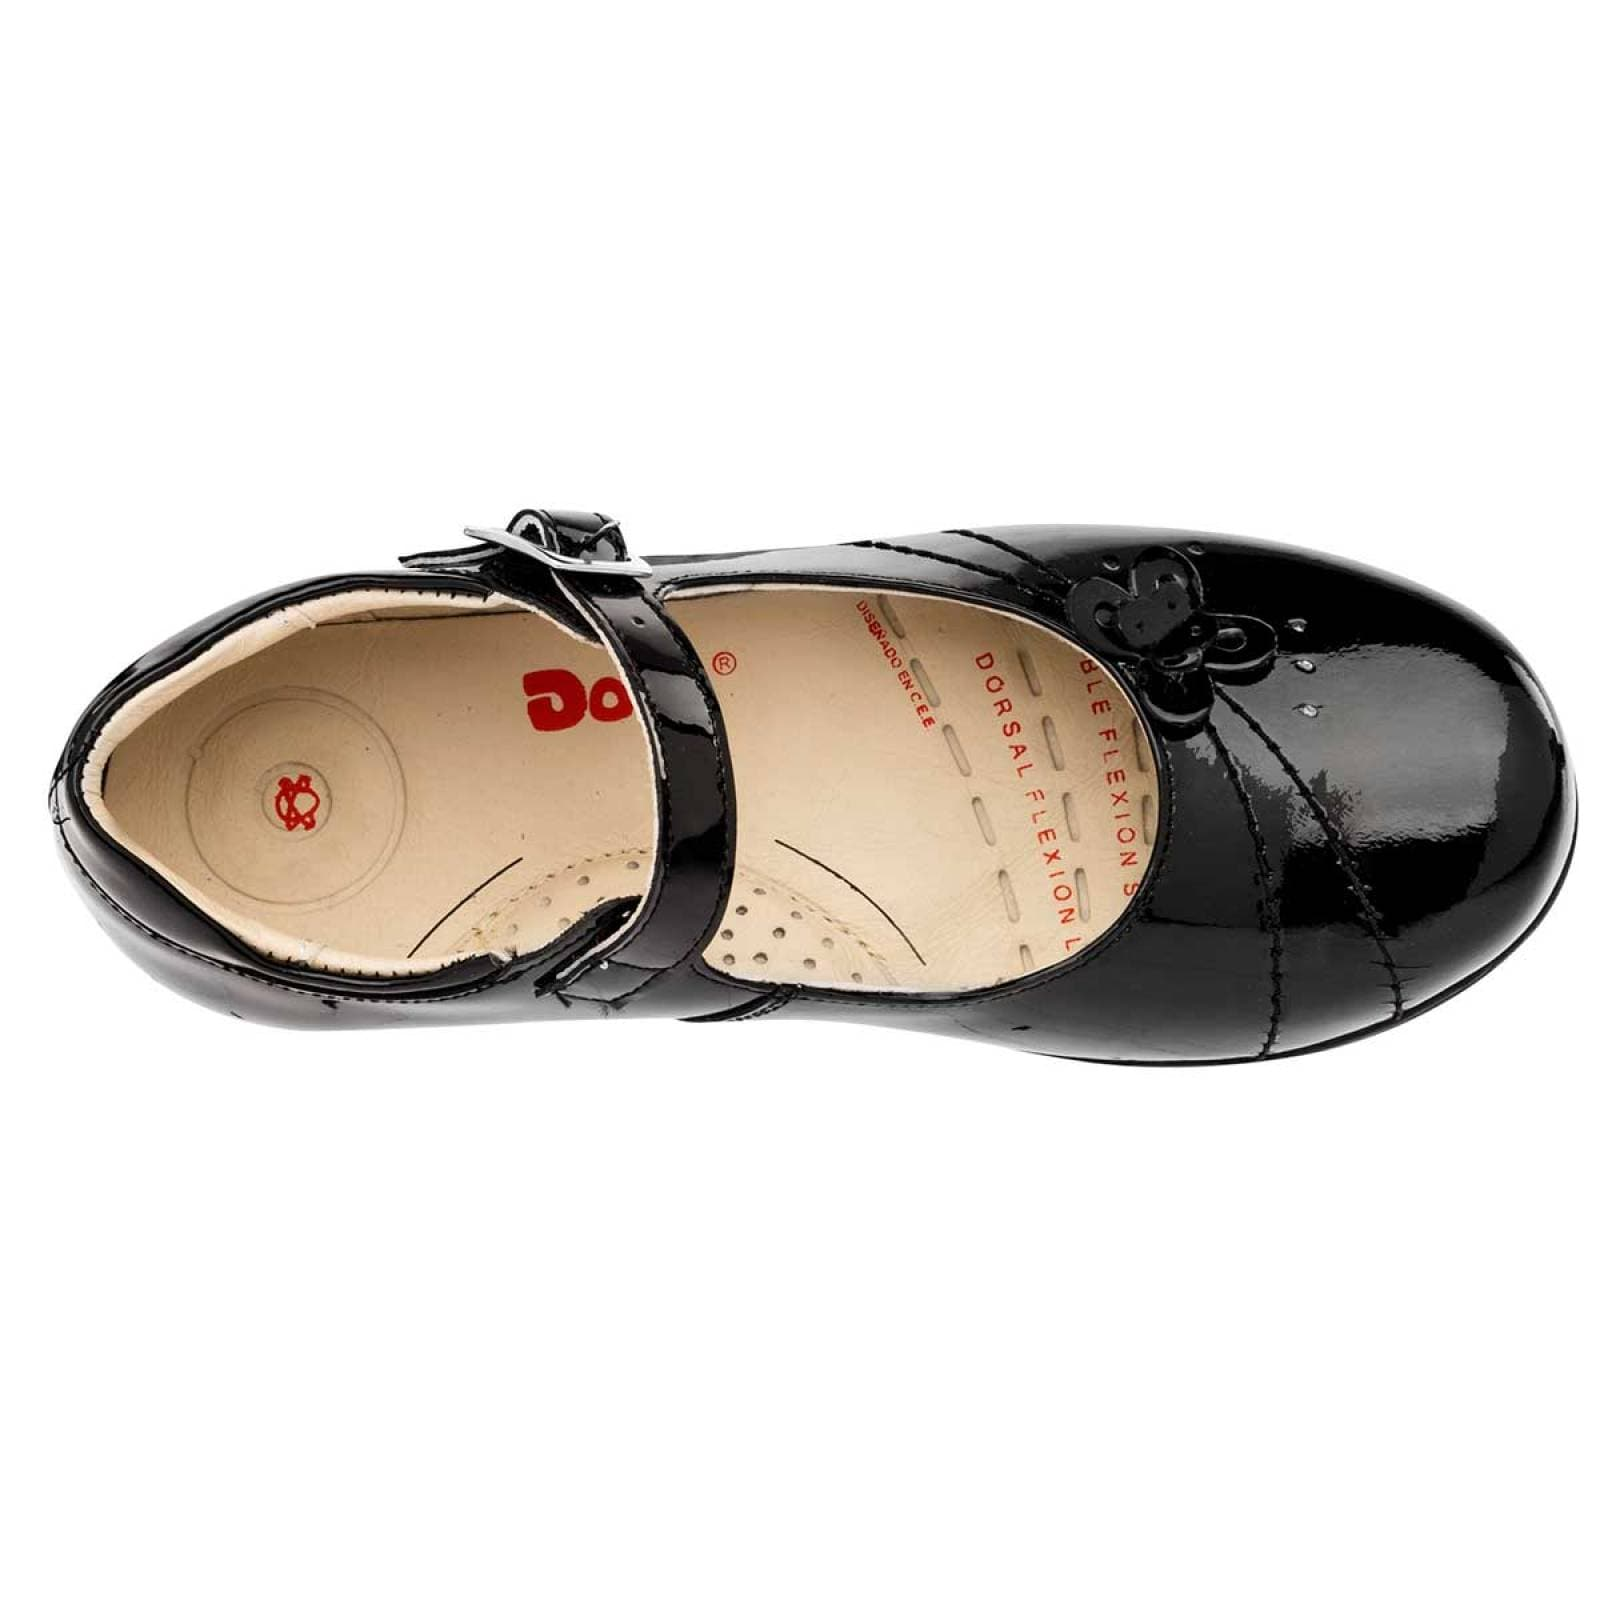 Dogi Zapato Niña Negro charol